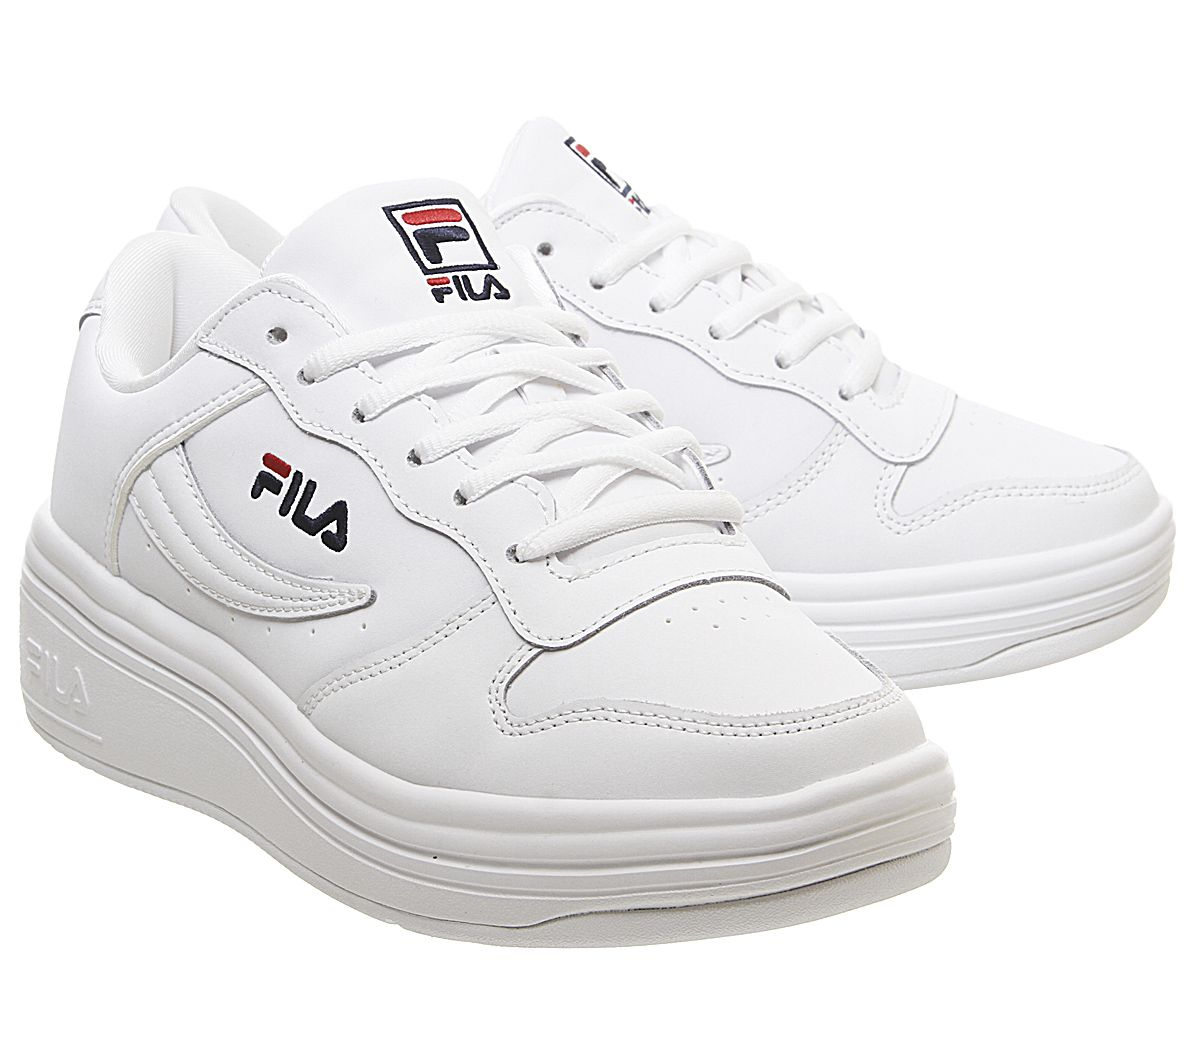 Debardeur-FILA-Wx-100-Trainers-White-FILA-Marine-Fila-Rouge-Baskets miniature 6